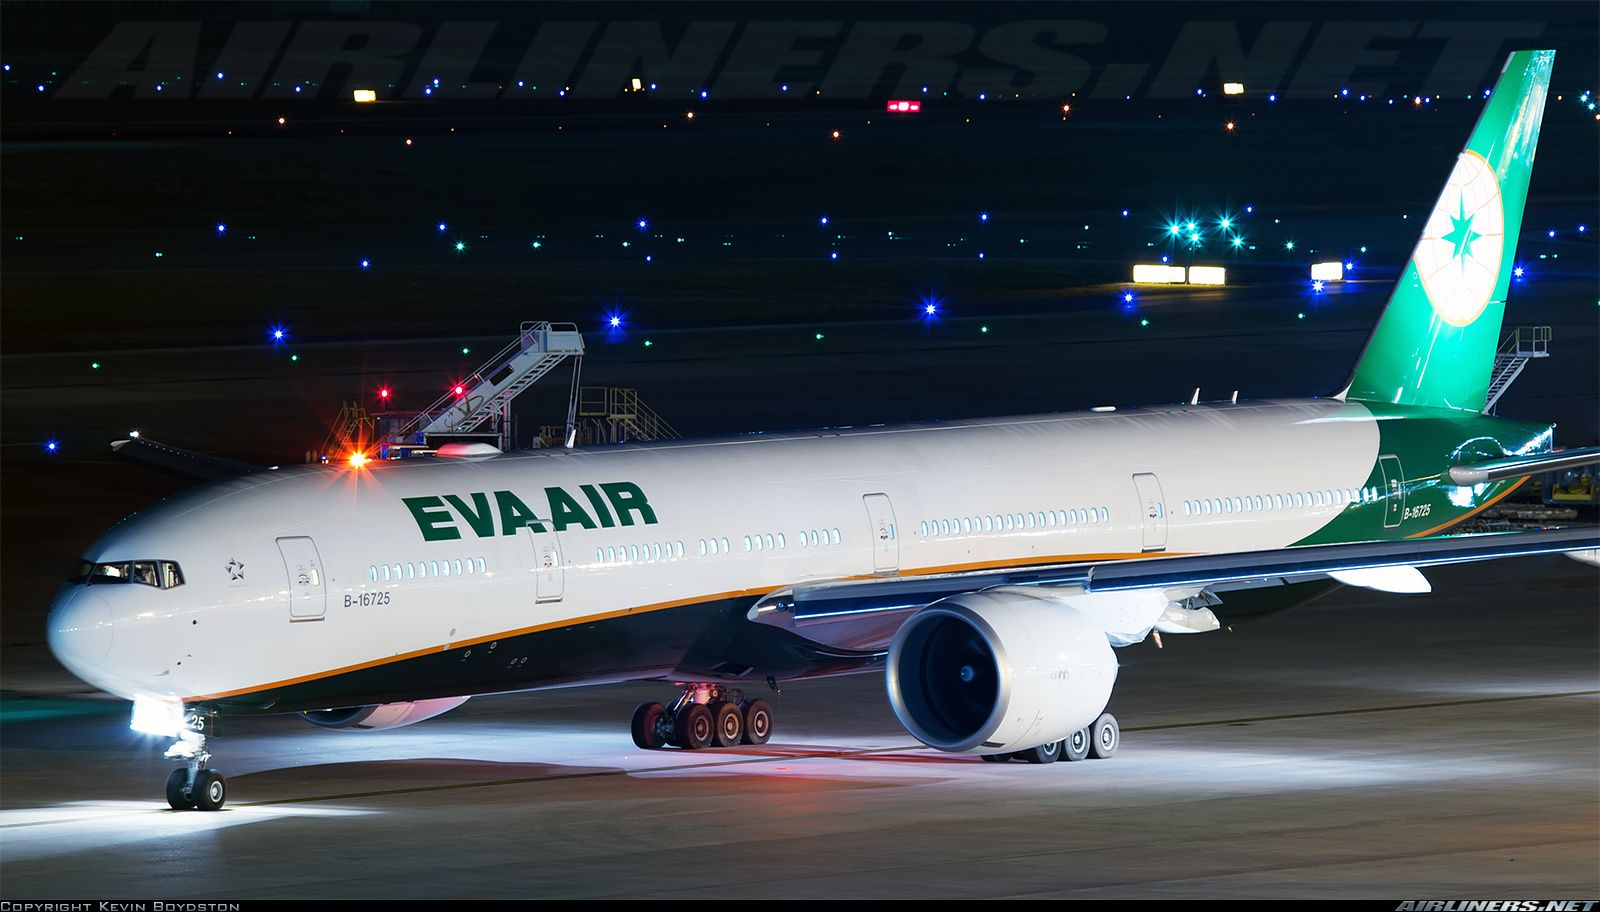 EVA Air B16725 Boeing 77735E/ER aircraft picture